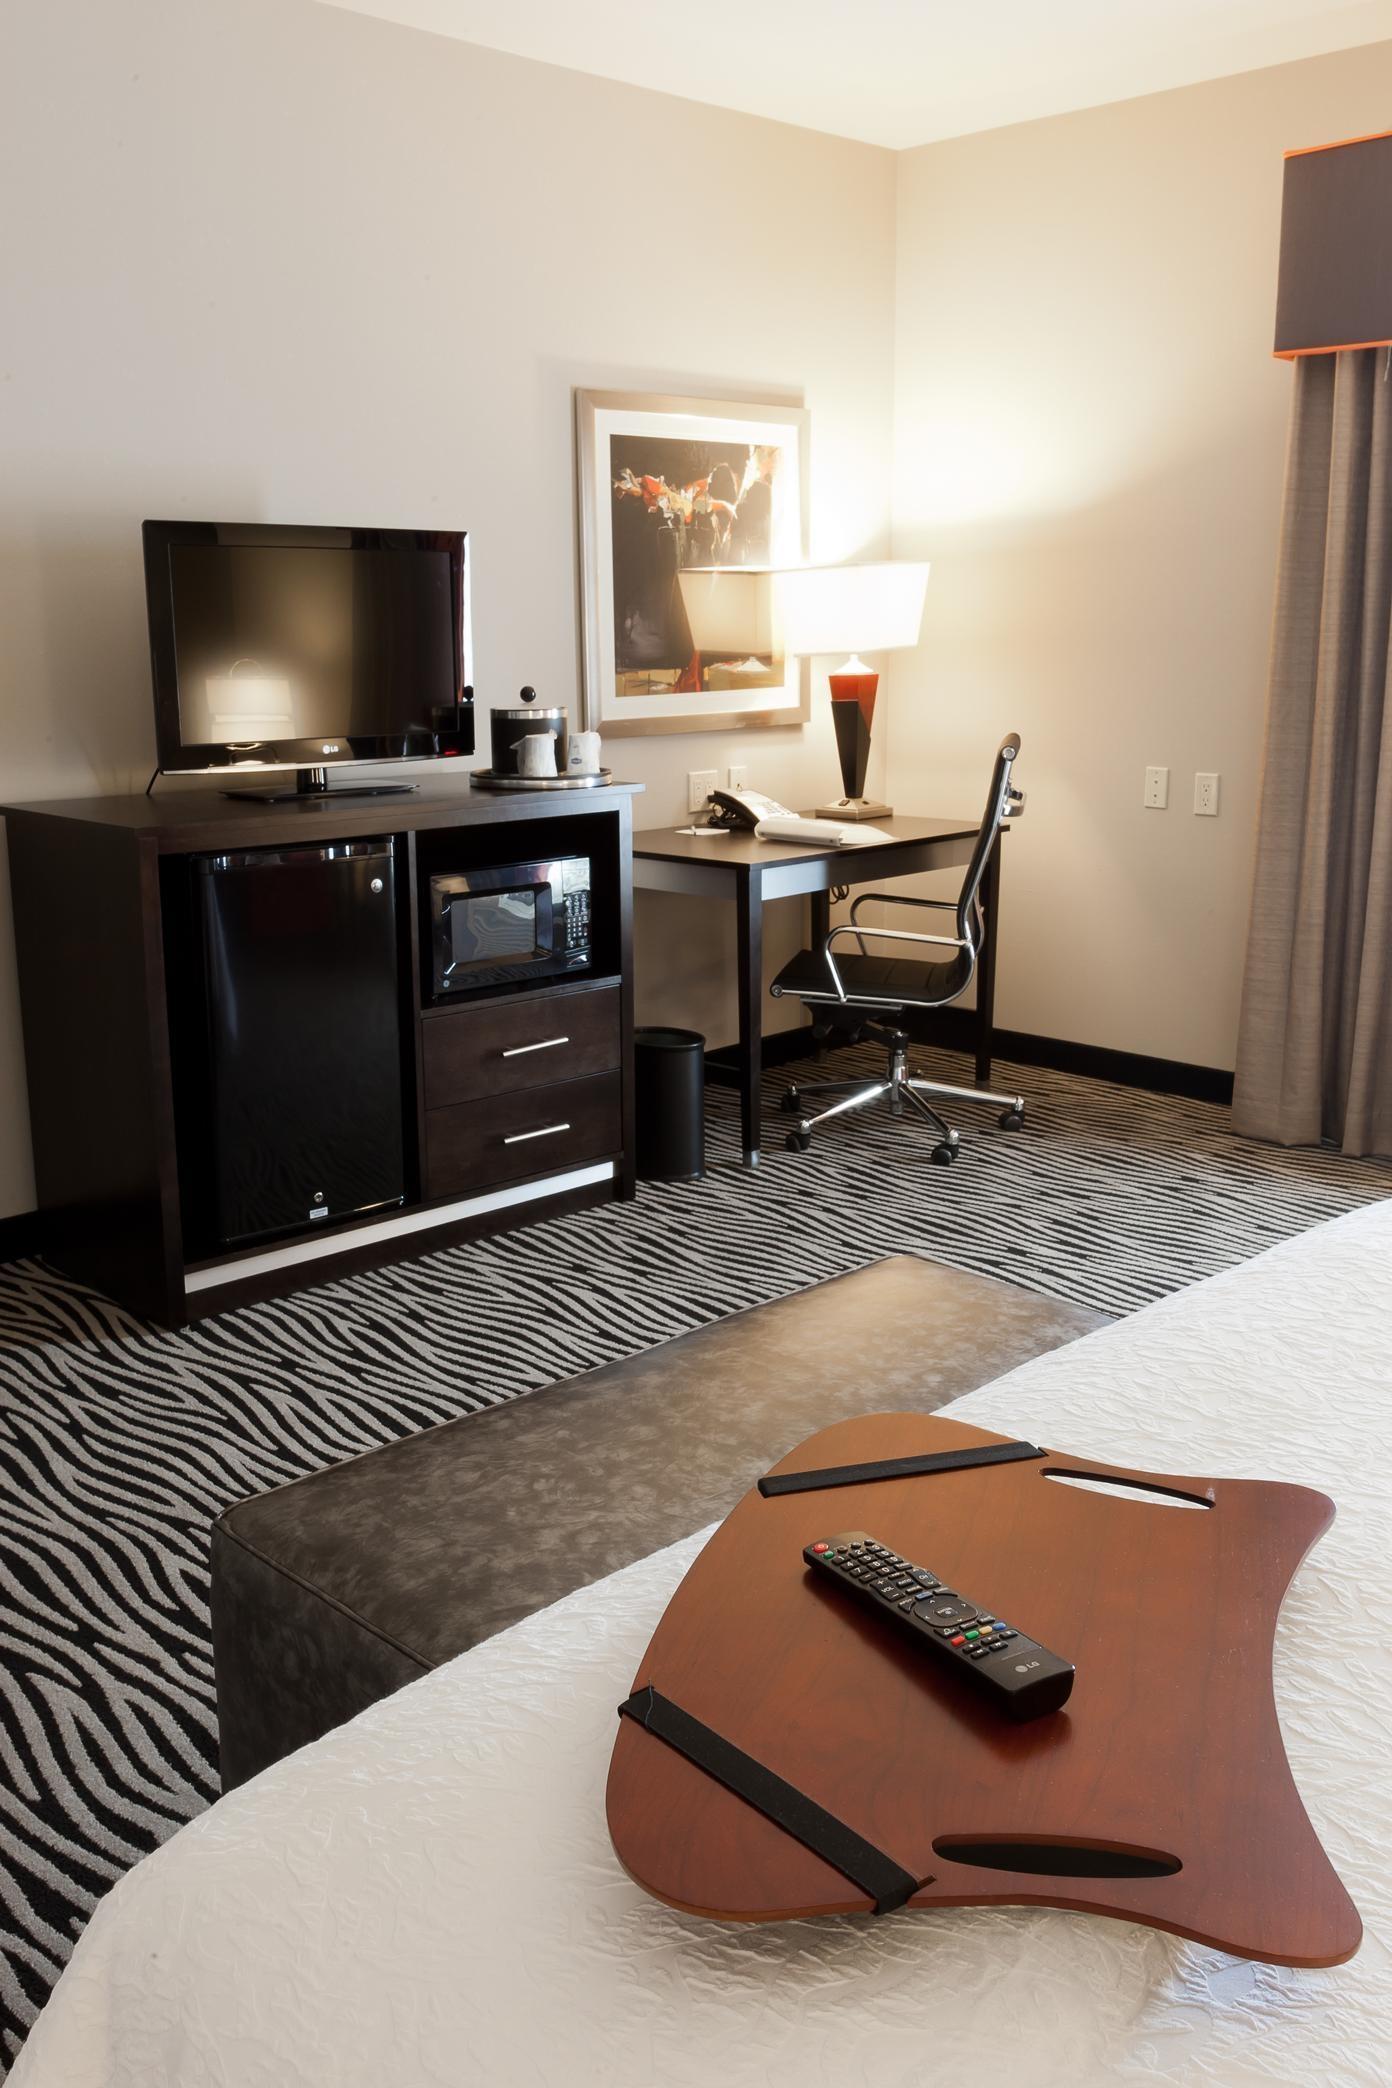 Hampton Inn & Suites Tulsa/Central image 8